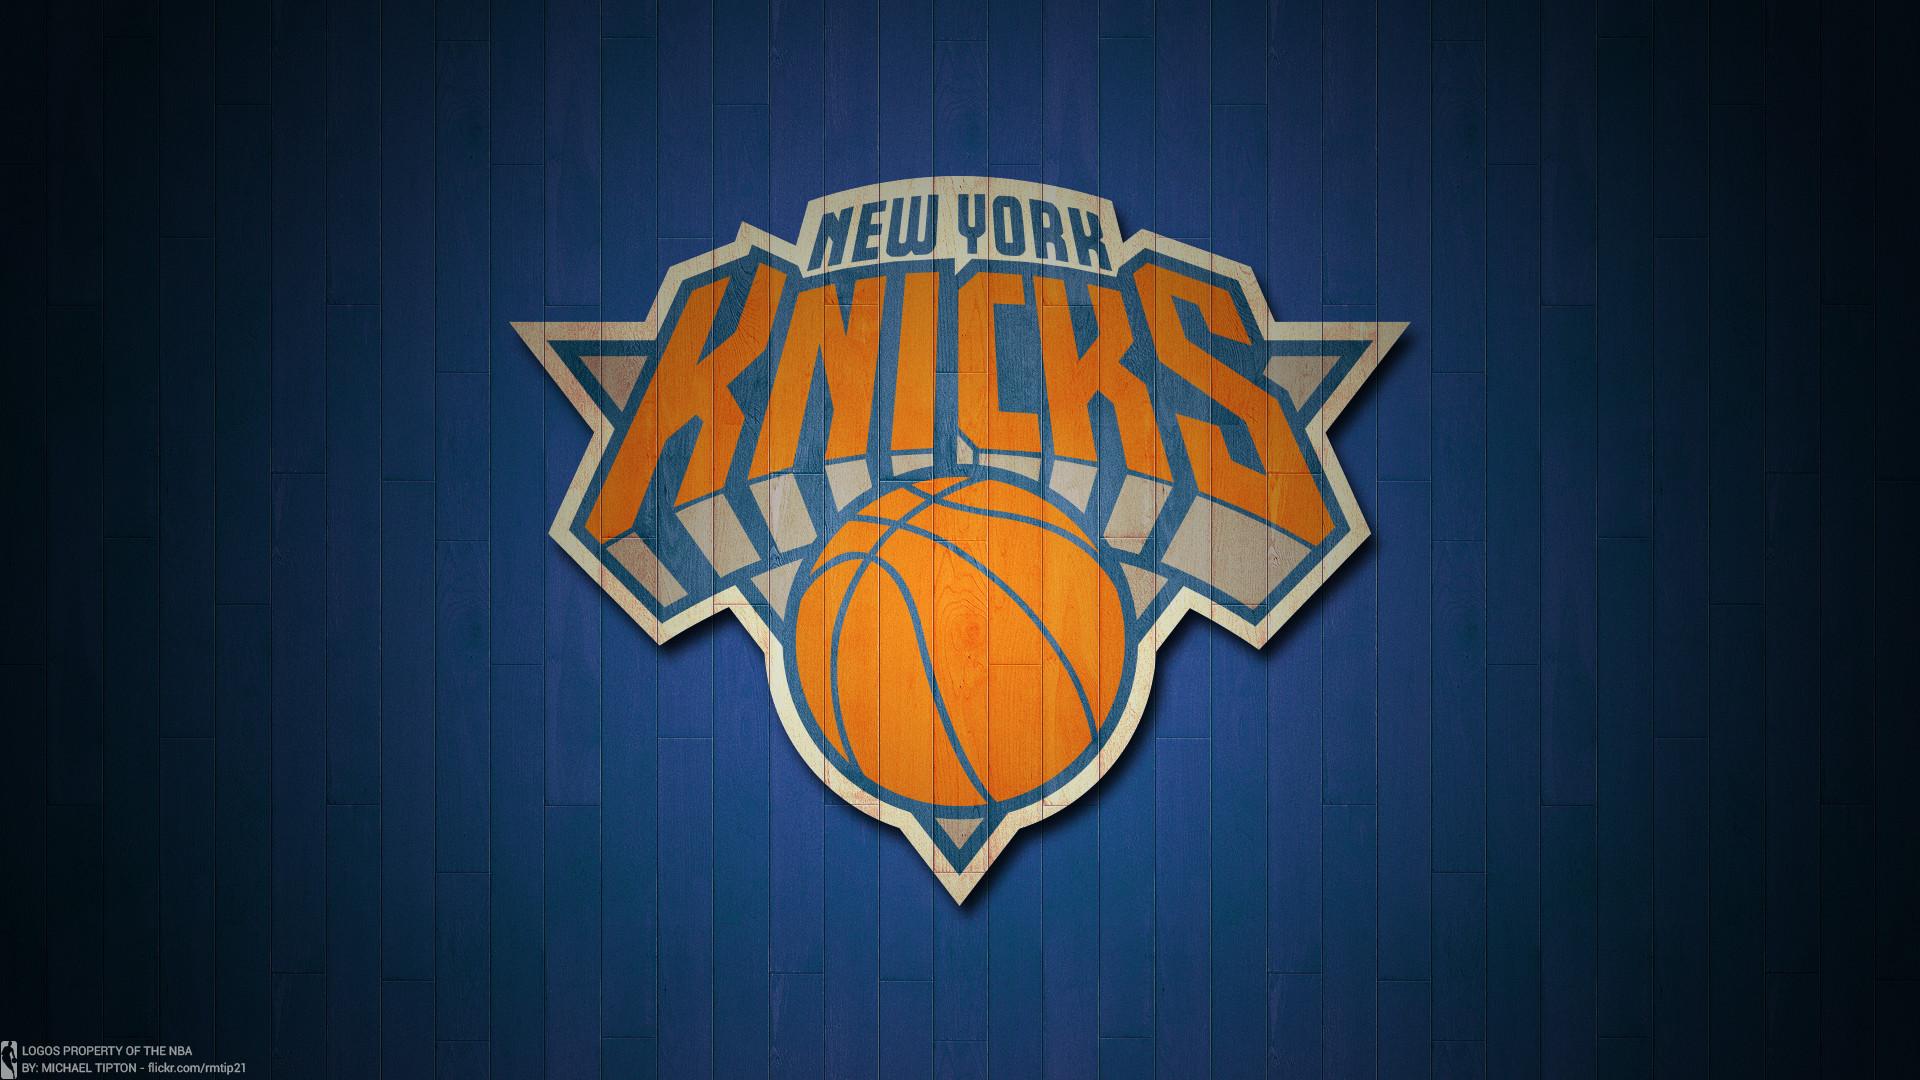 Knicks wallpaper 1920x1080 nba 2017 new york knicks hardwood logo desktop wallpaper voltagebd Image collections